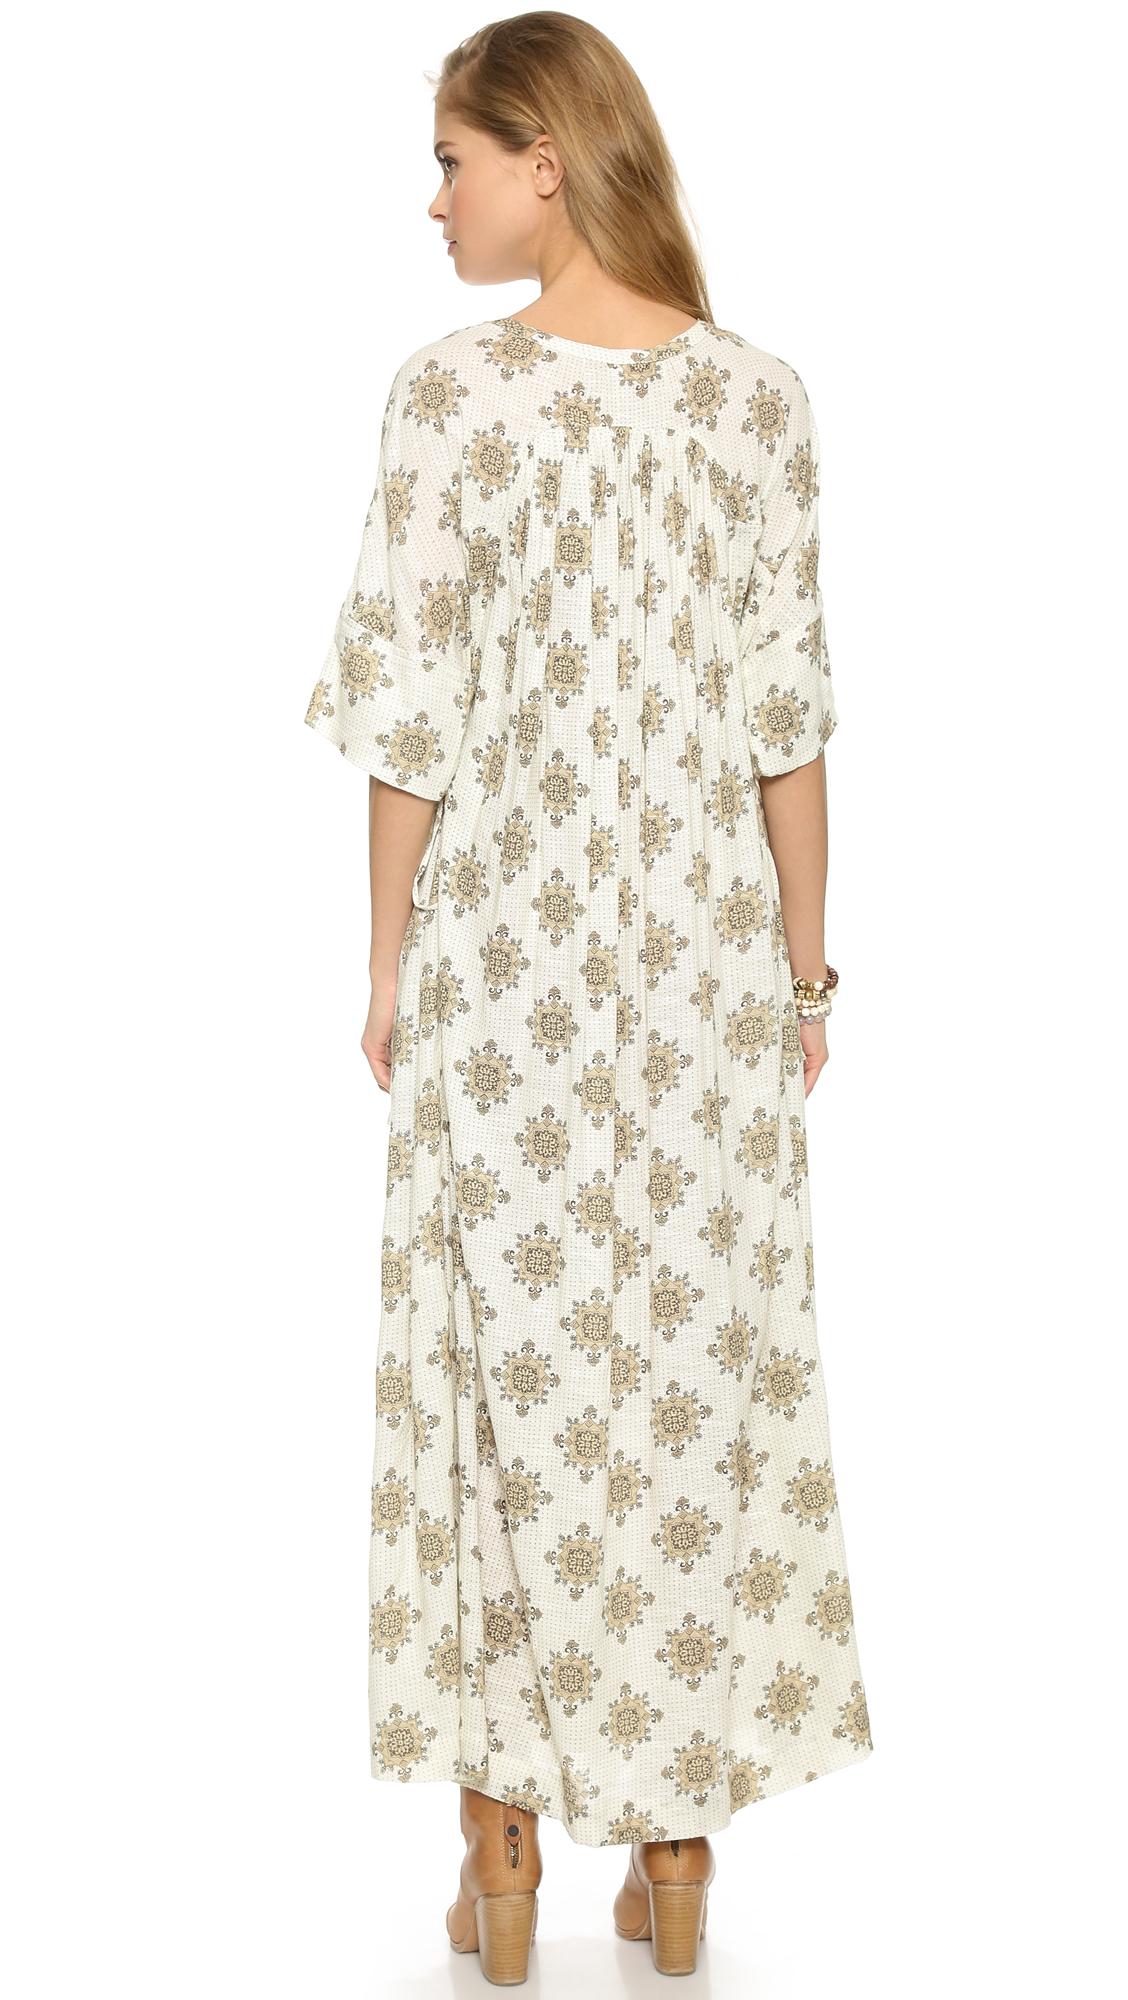 21f0654afa999 Free People Printed Oasis Maxi Dress